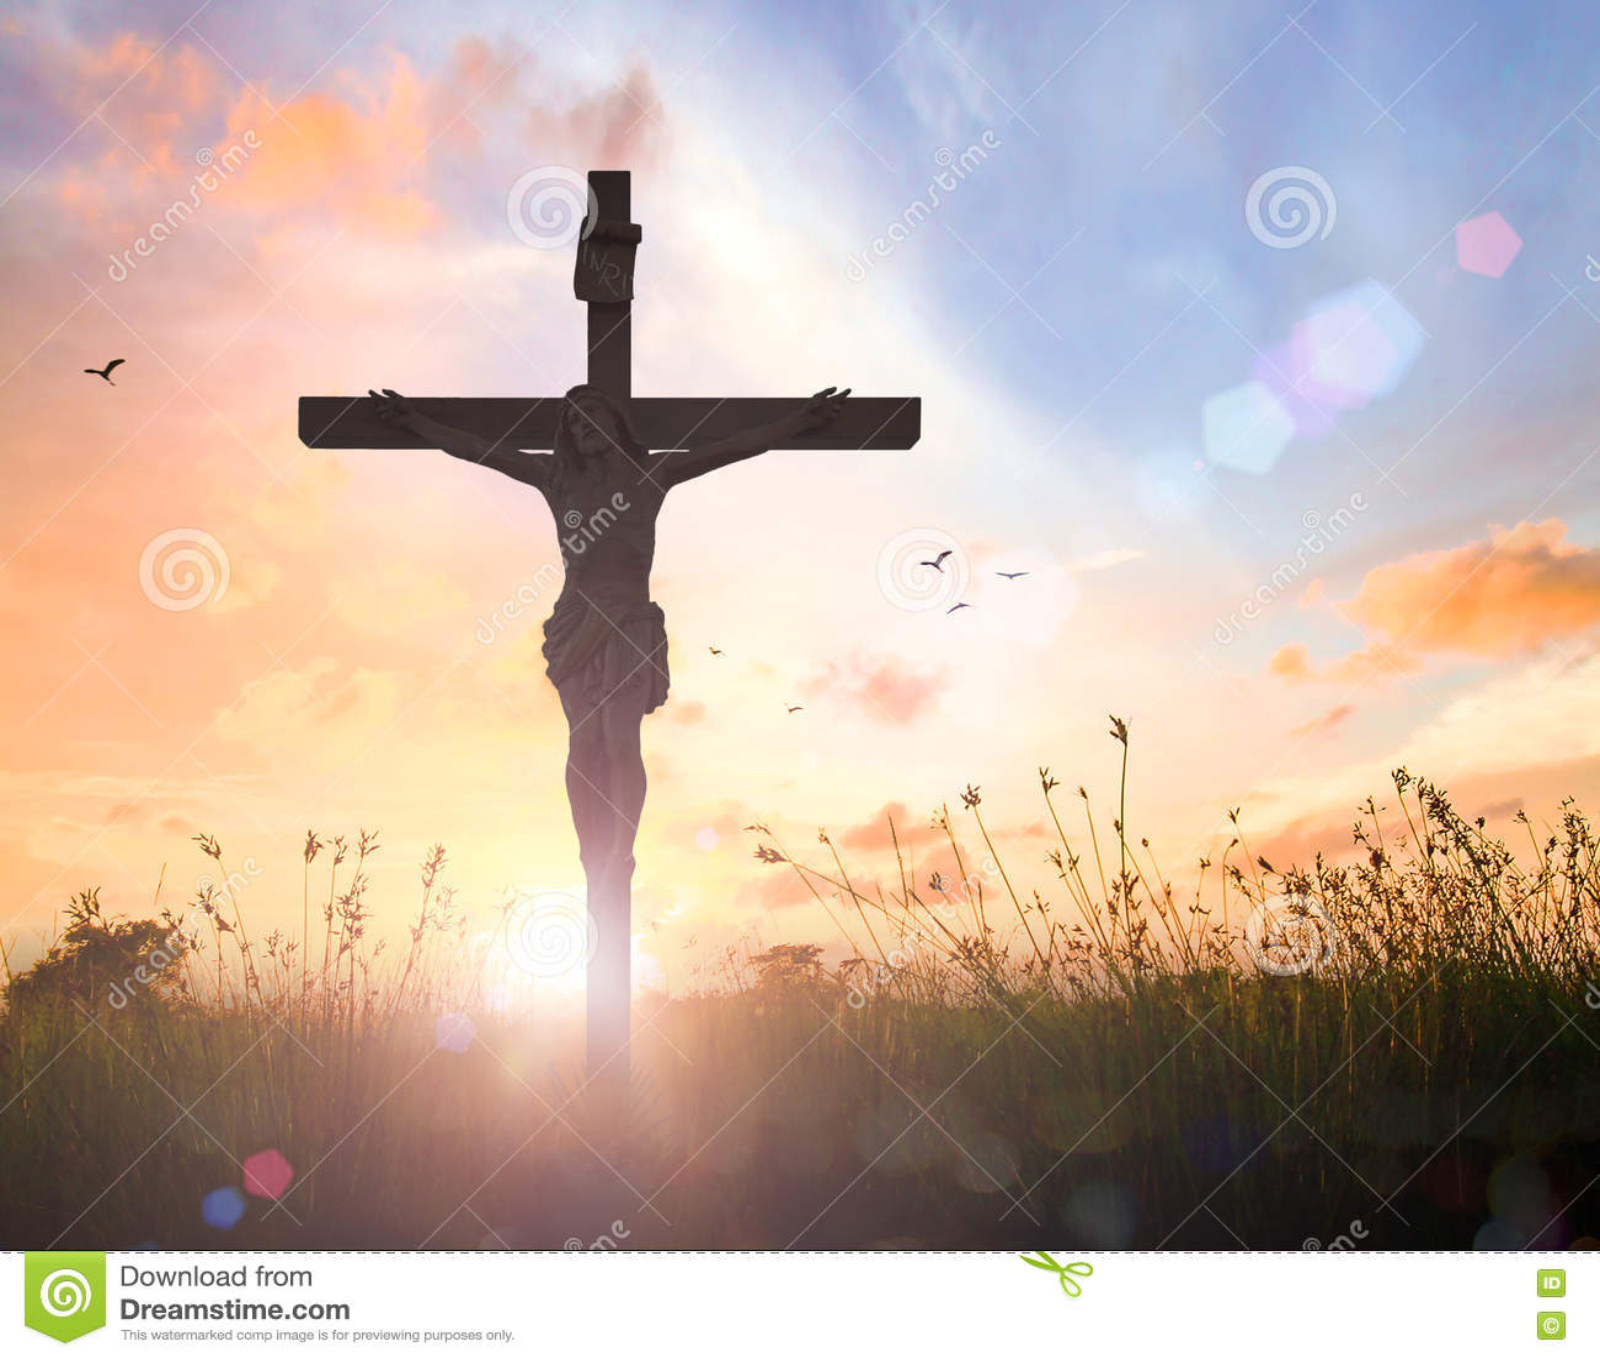 jesus christ on the cross on sunset stock photo image 73336924